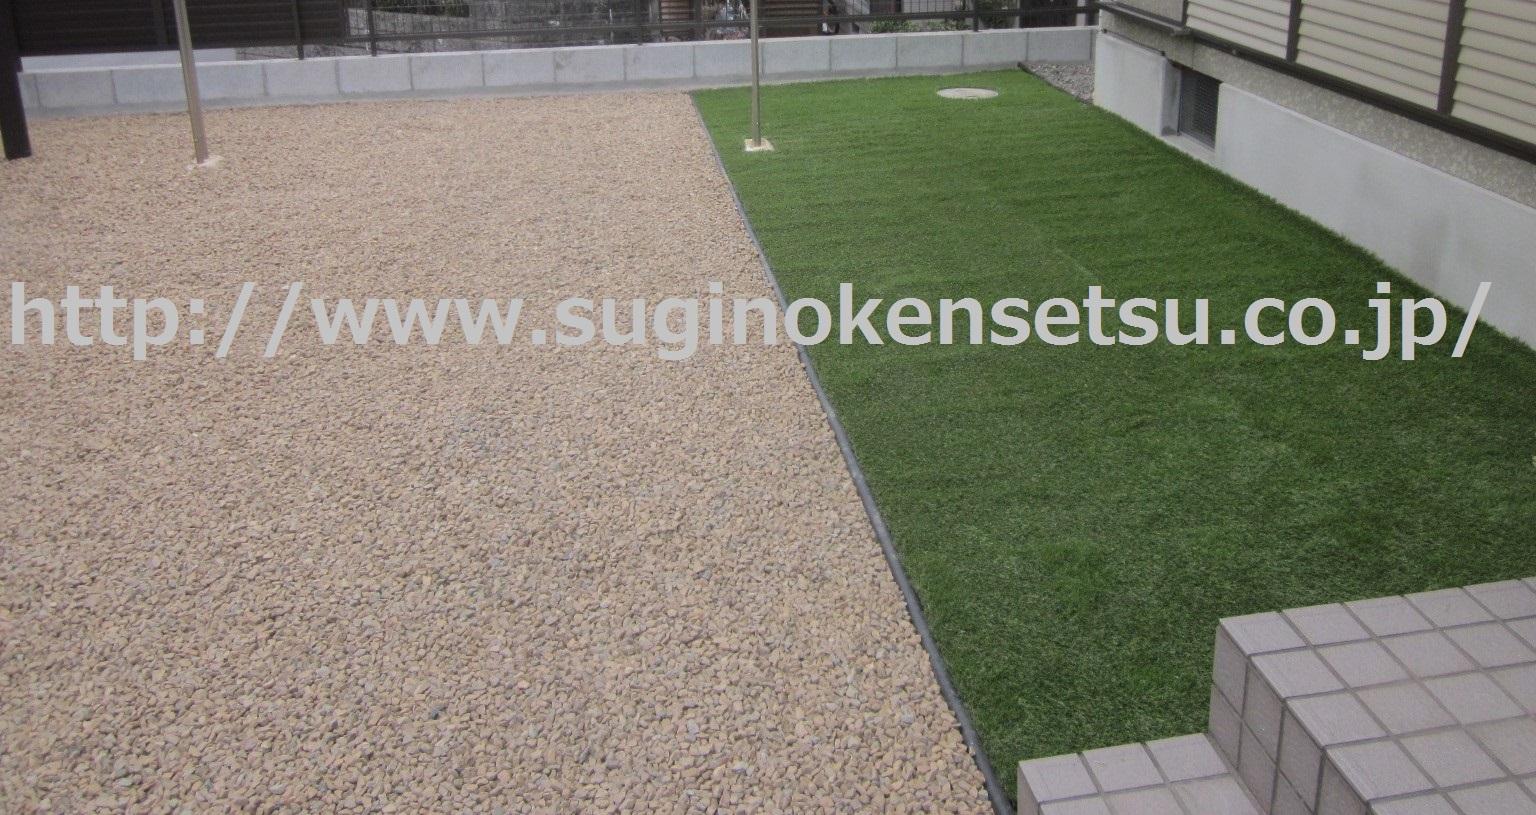 防草対策、砂利敷き、人工芝敷き